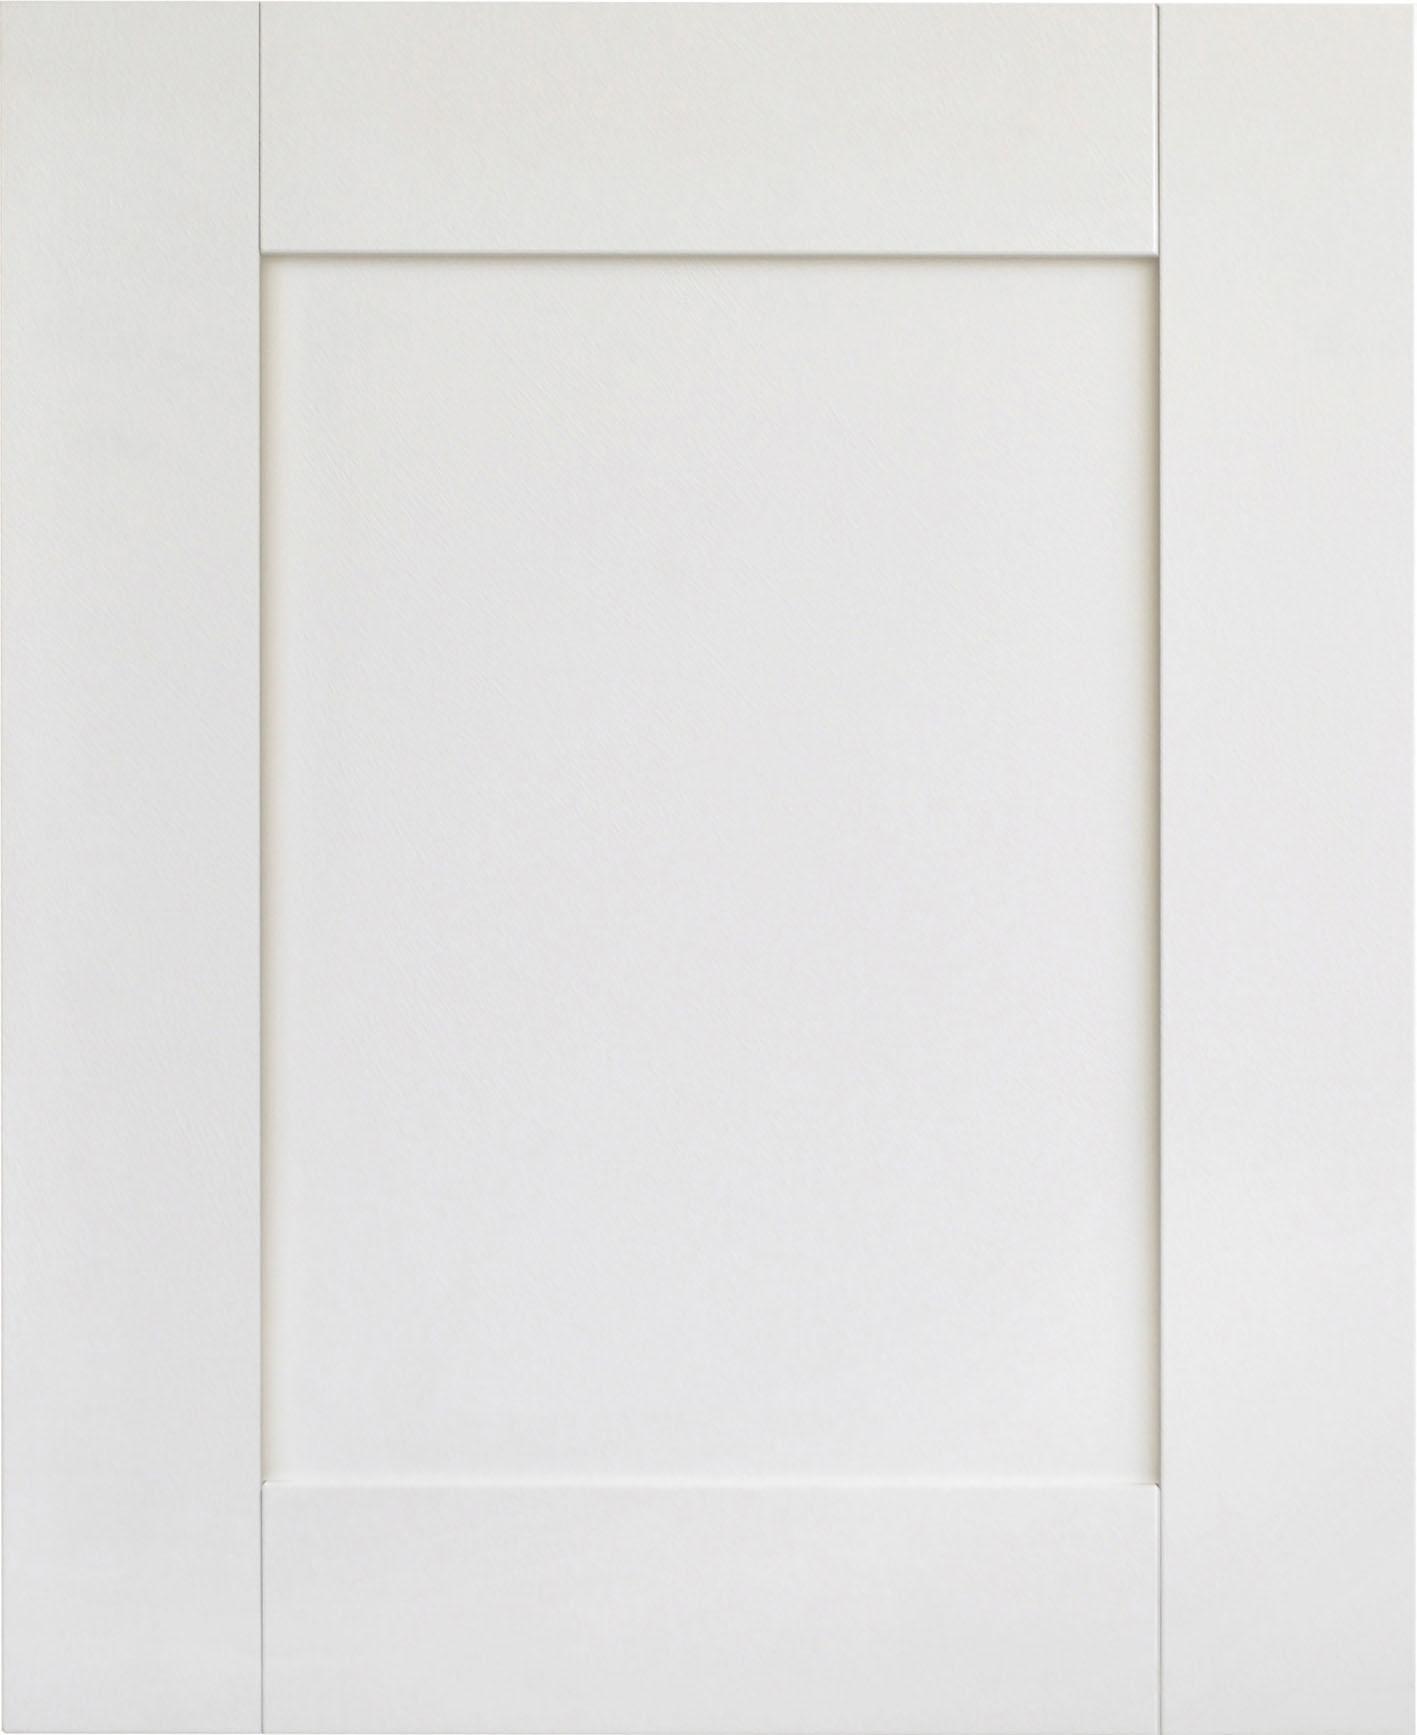 Square Frame 0743-SQ